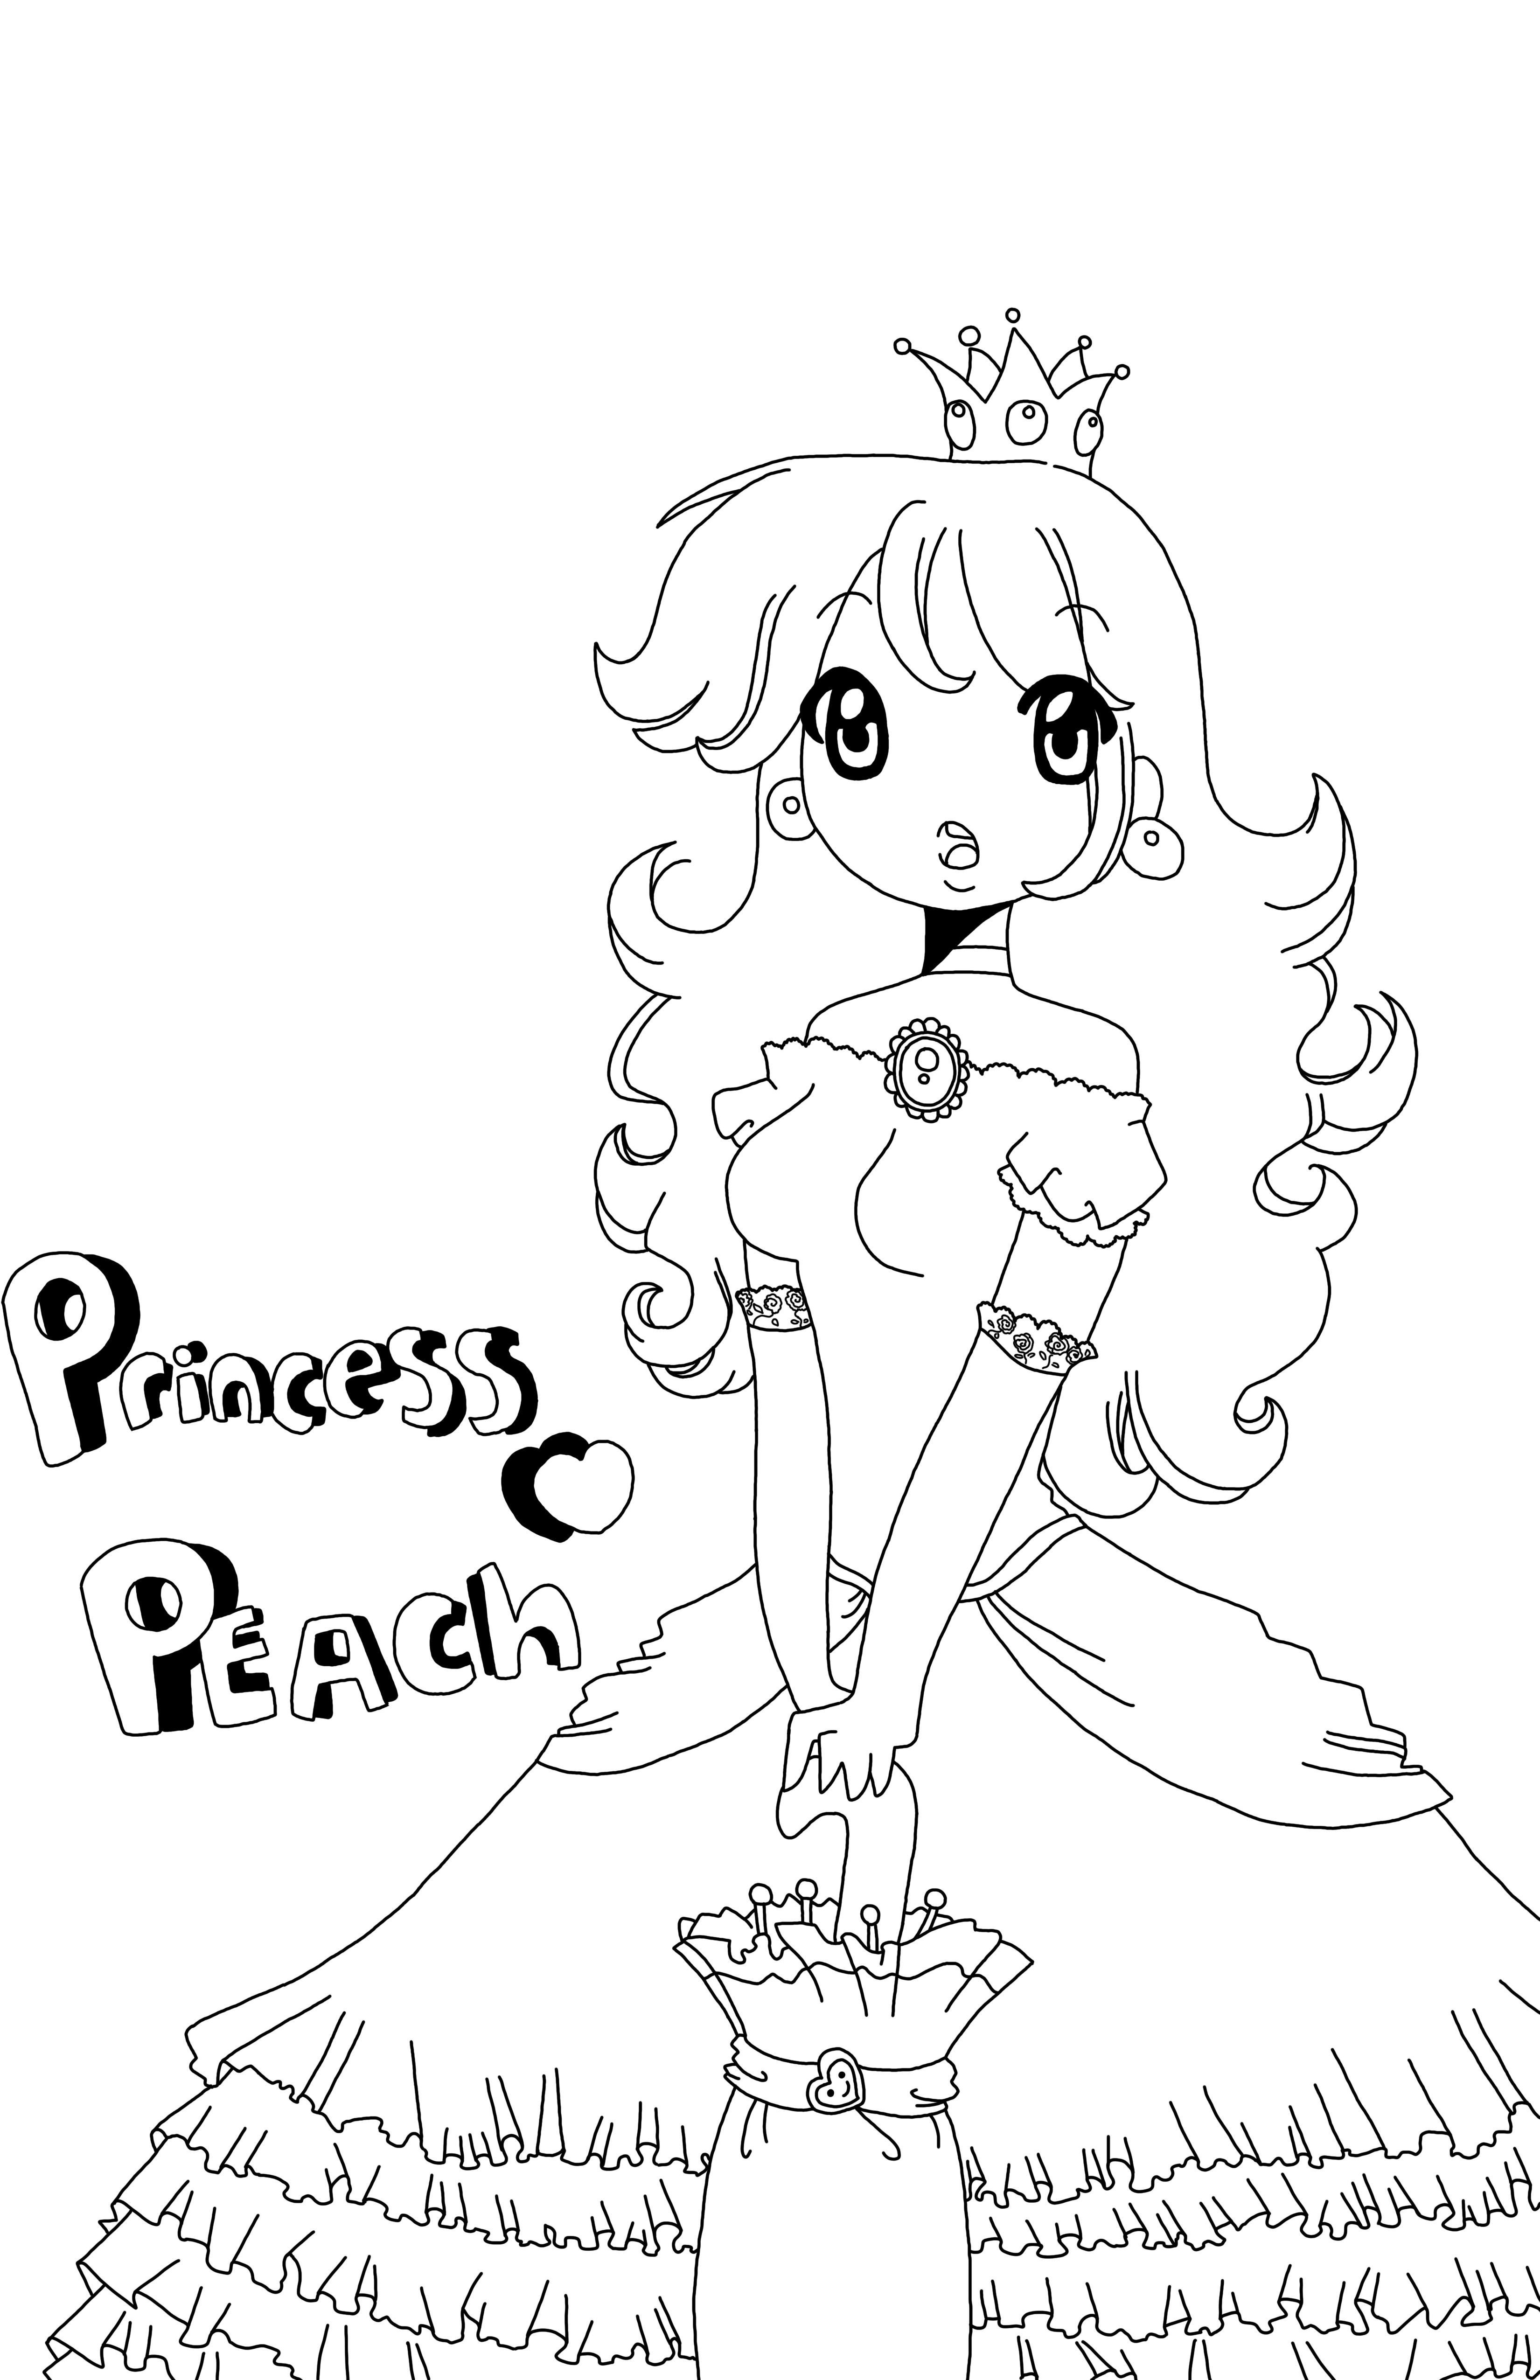 Line Art Poster : Princess peach poster line art by starvalerian on deviantart